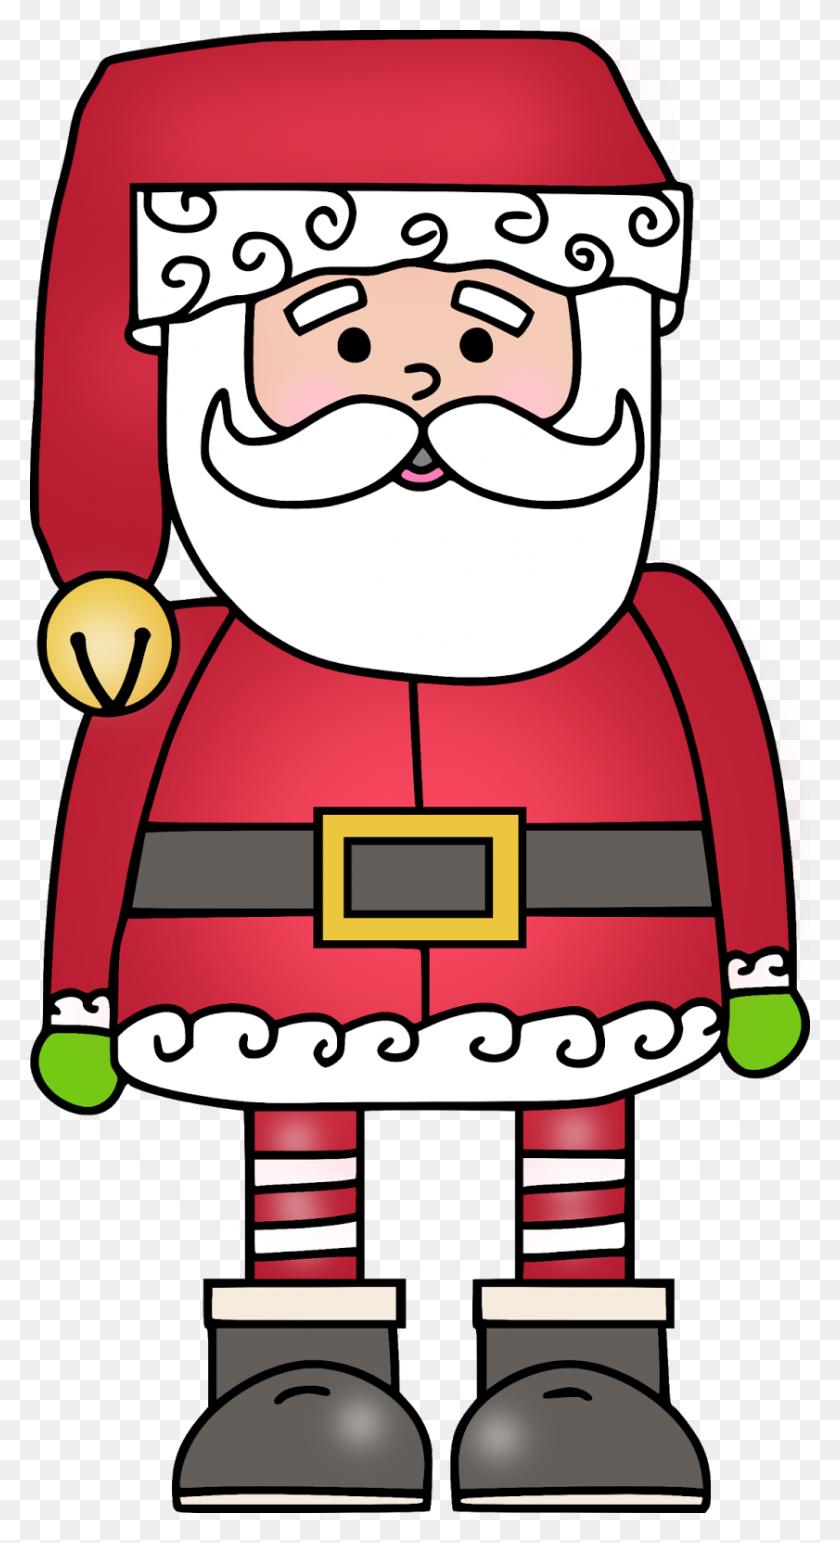 Santa claus clip art website free clipart images 4 - Cliparting.com